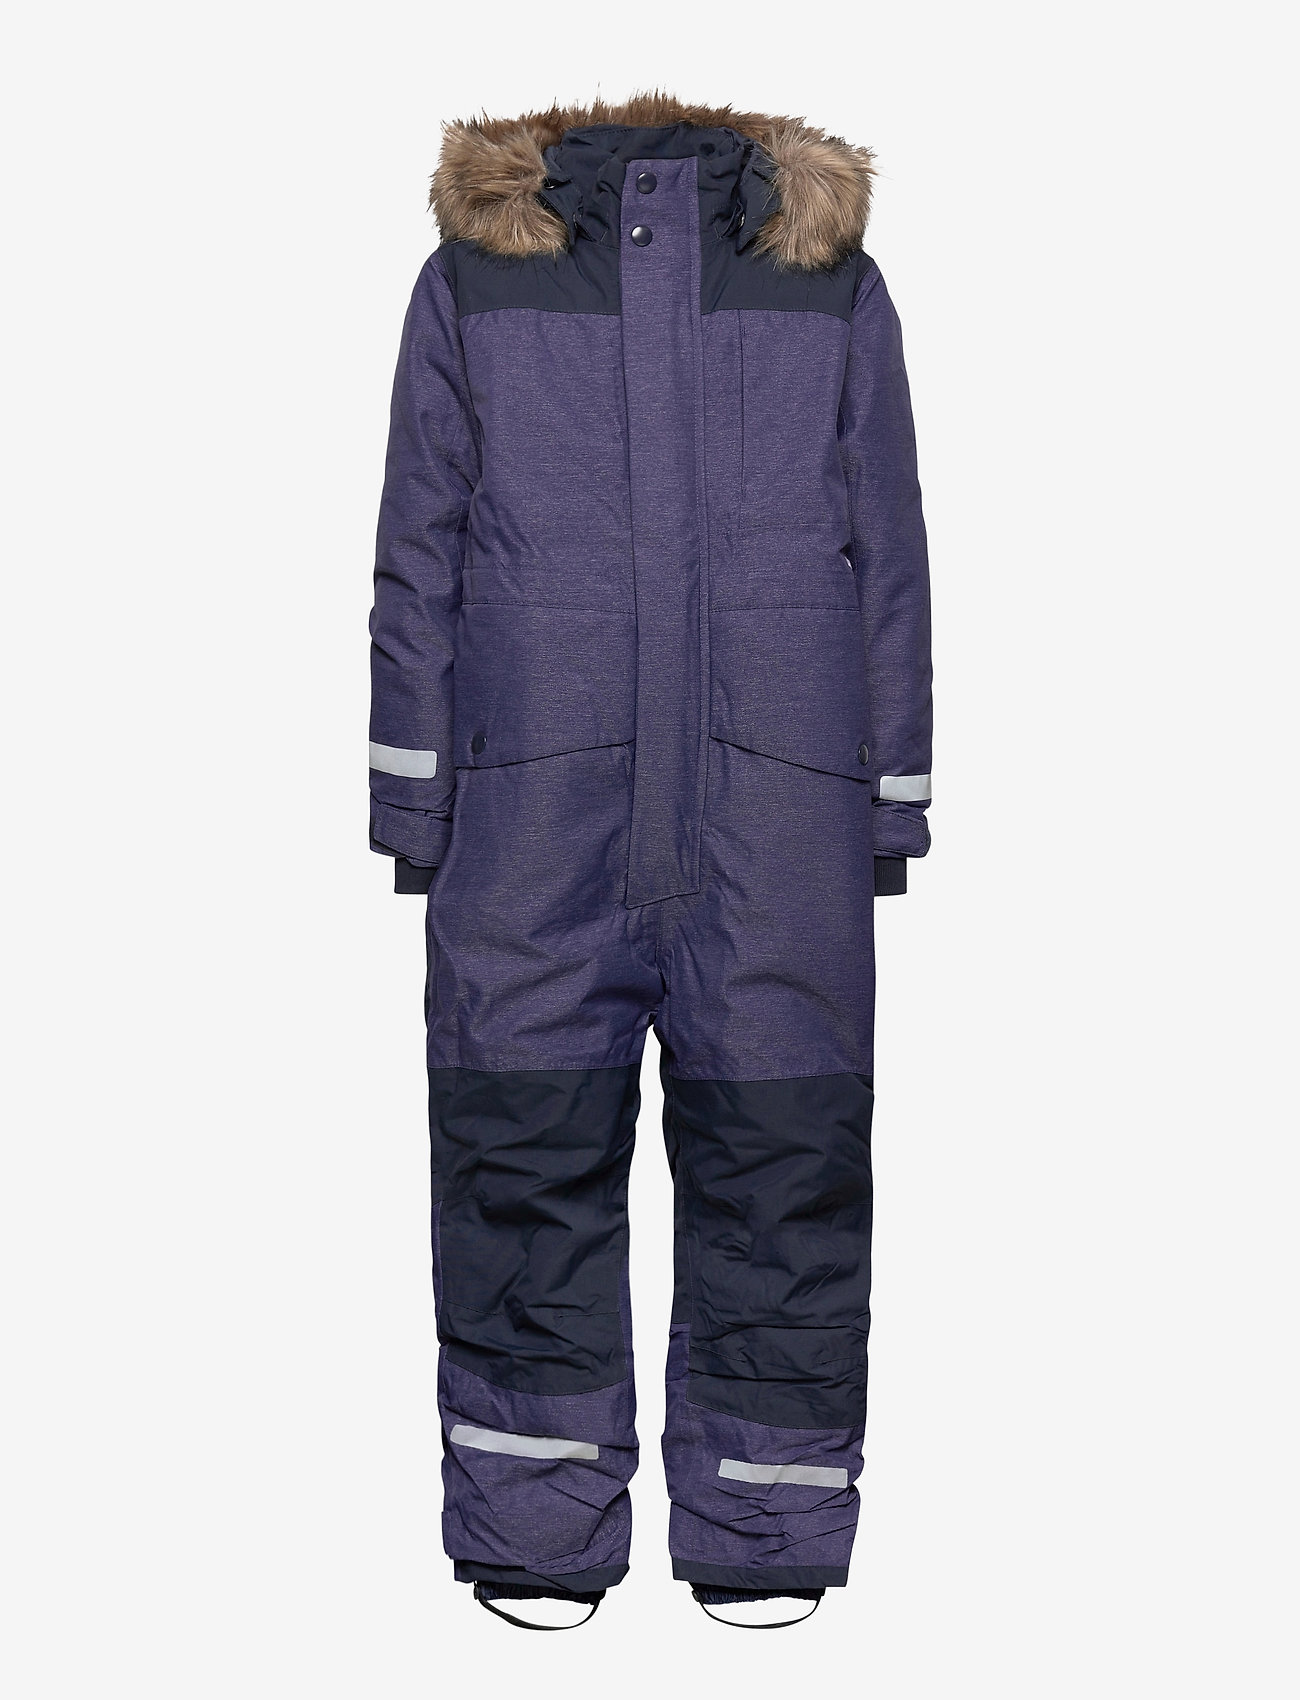 Didriksons - POLARBJÖRNEN KIDS CO - snowsuit - denim blue - 0